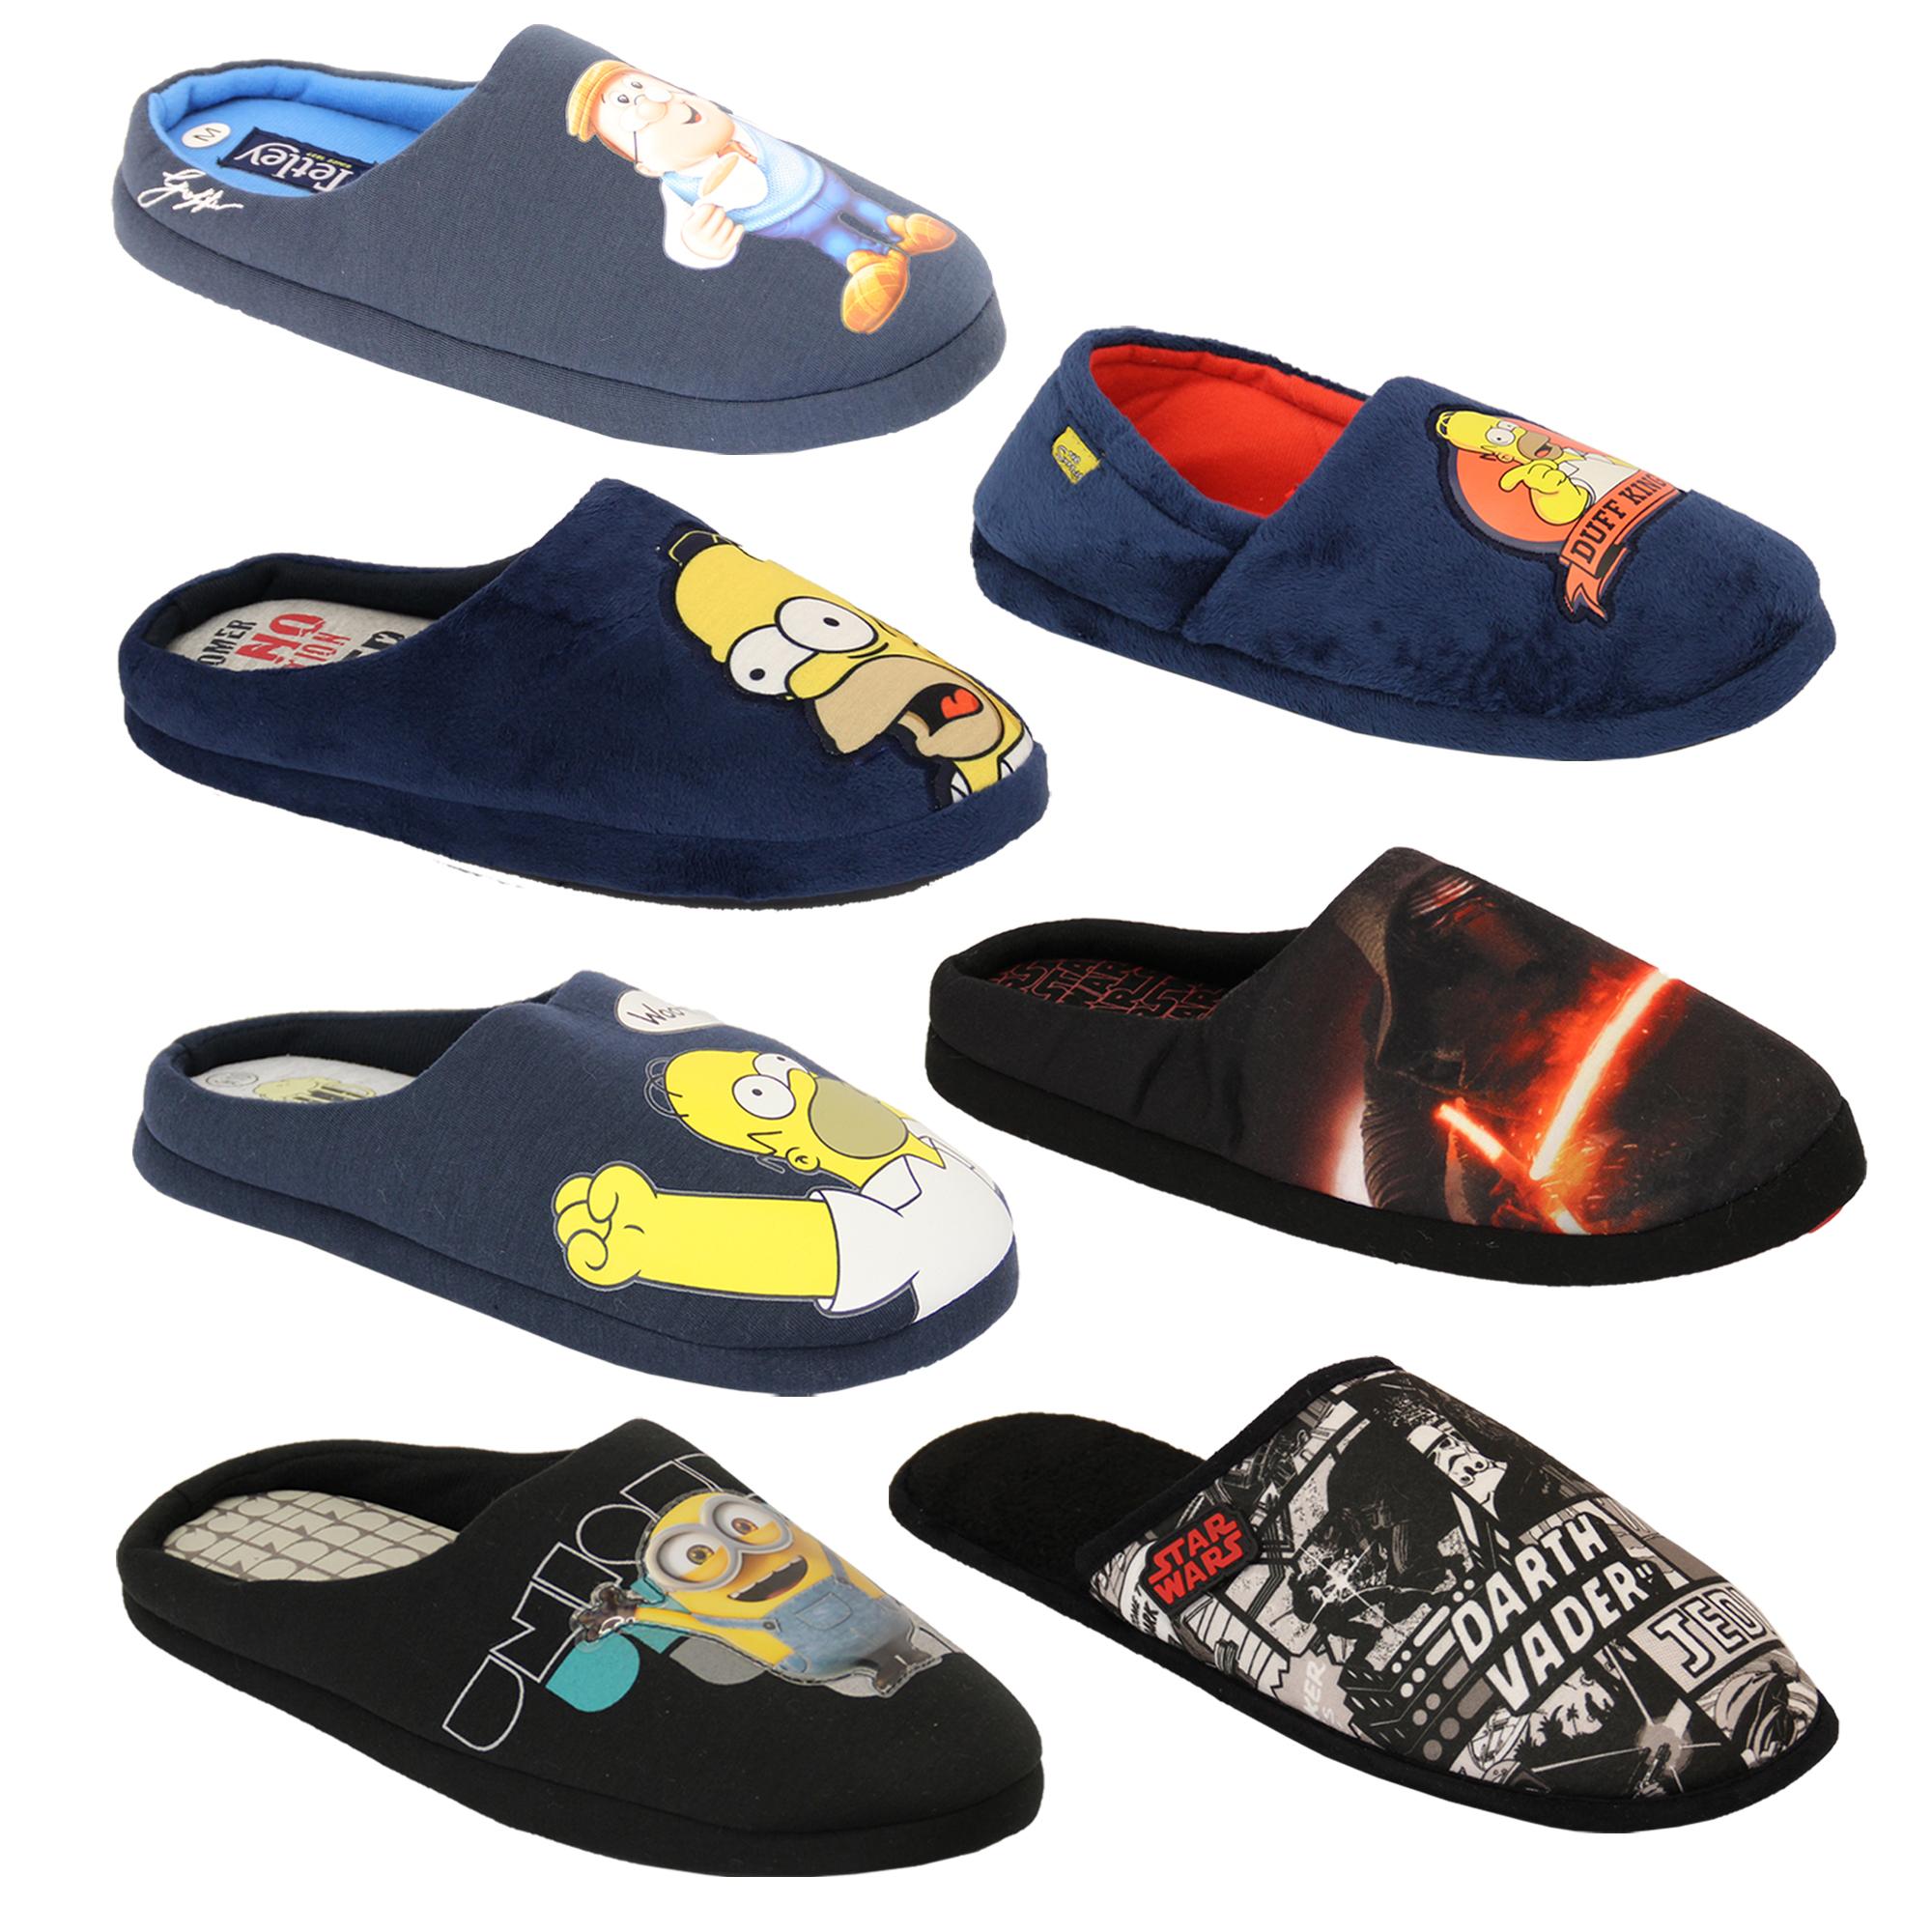 83c0c8de7ce00 mens slippers homer simpsons minions Star Wars tetley mule sandals ...